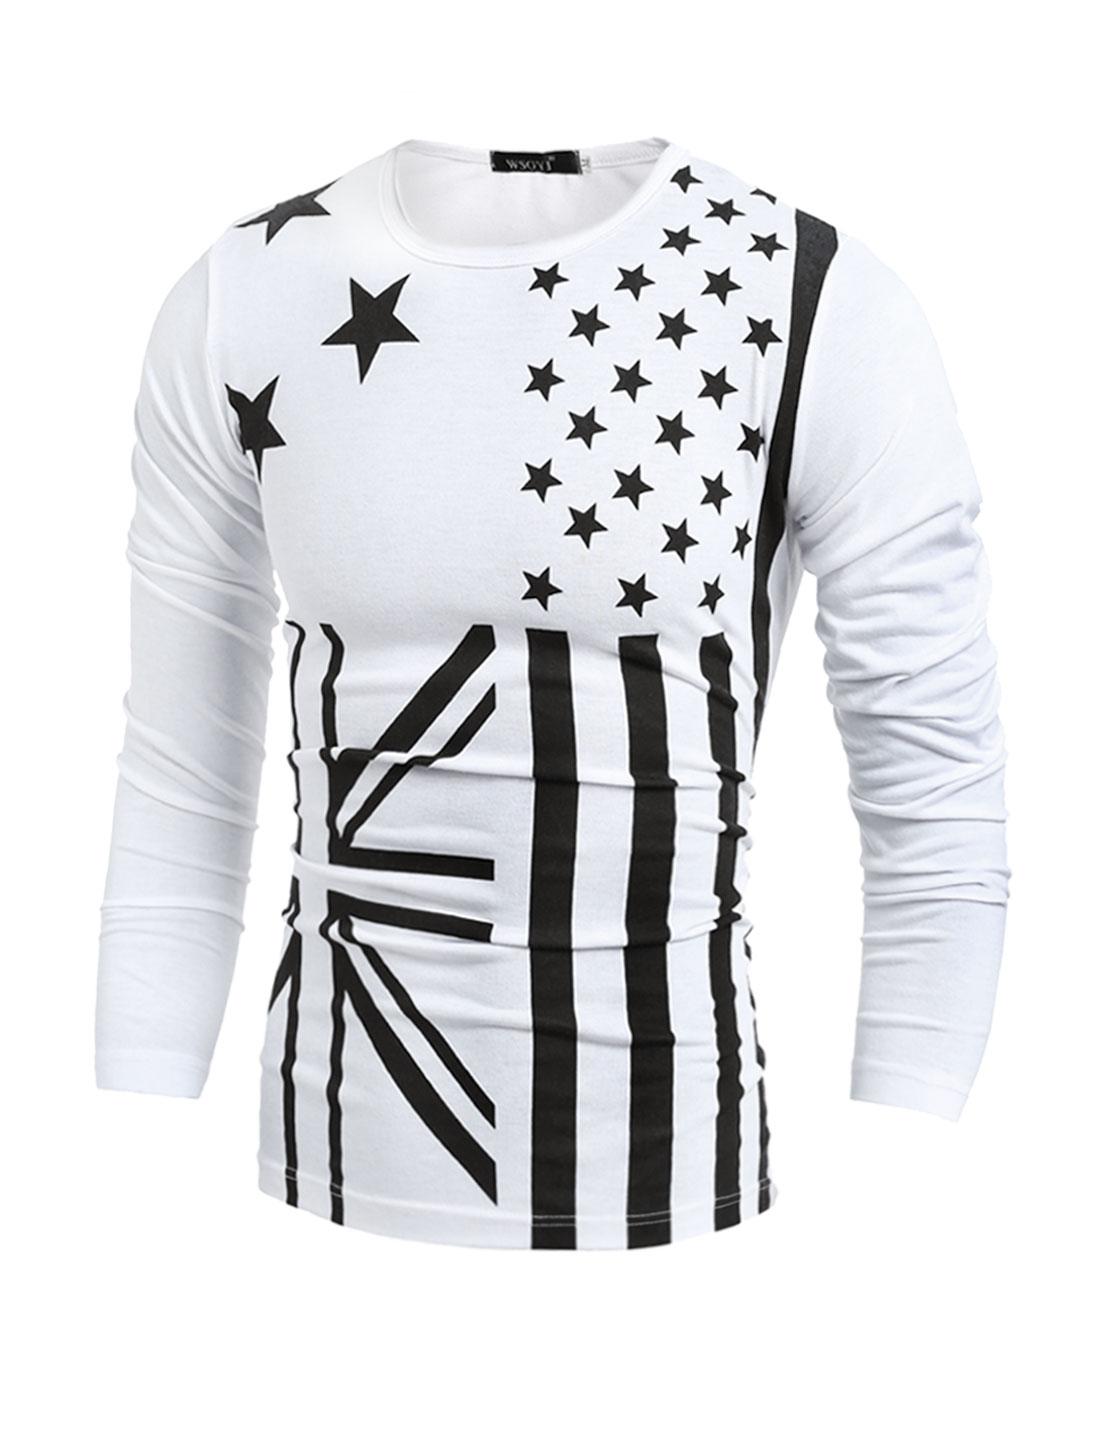 Man Crew Neck Stripes Stars Union Jack Flag Shirt White S